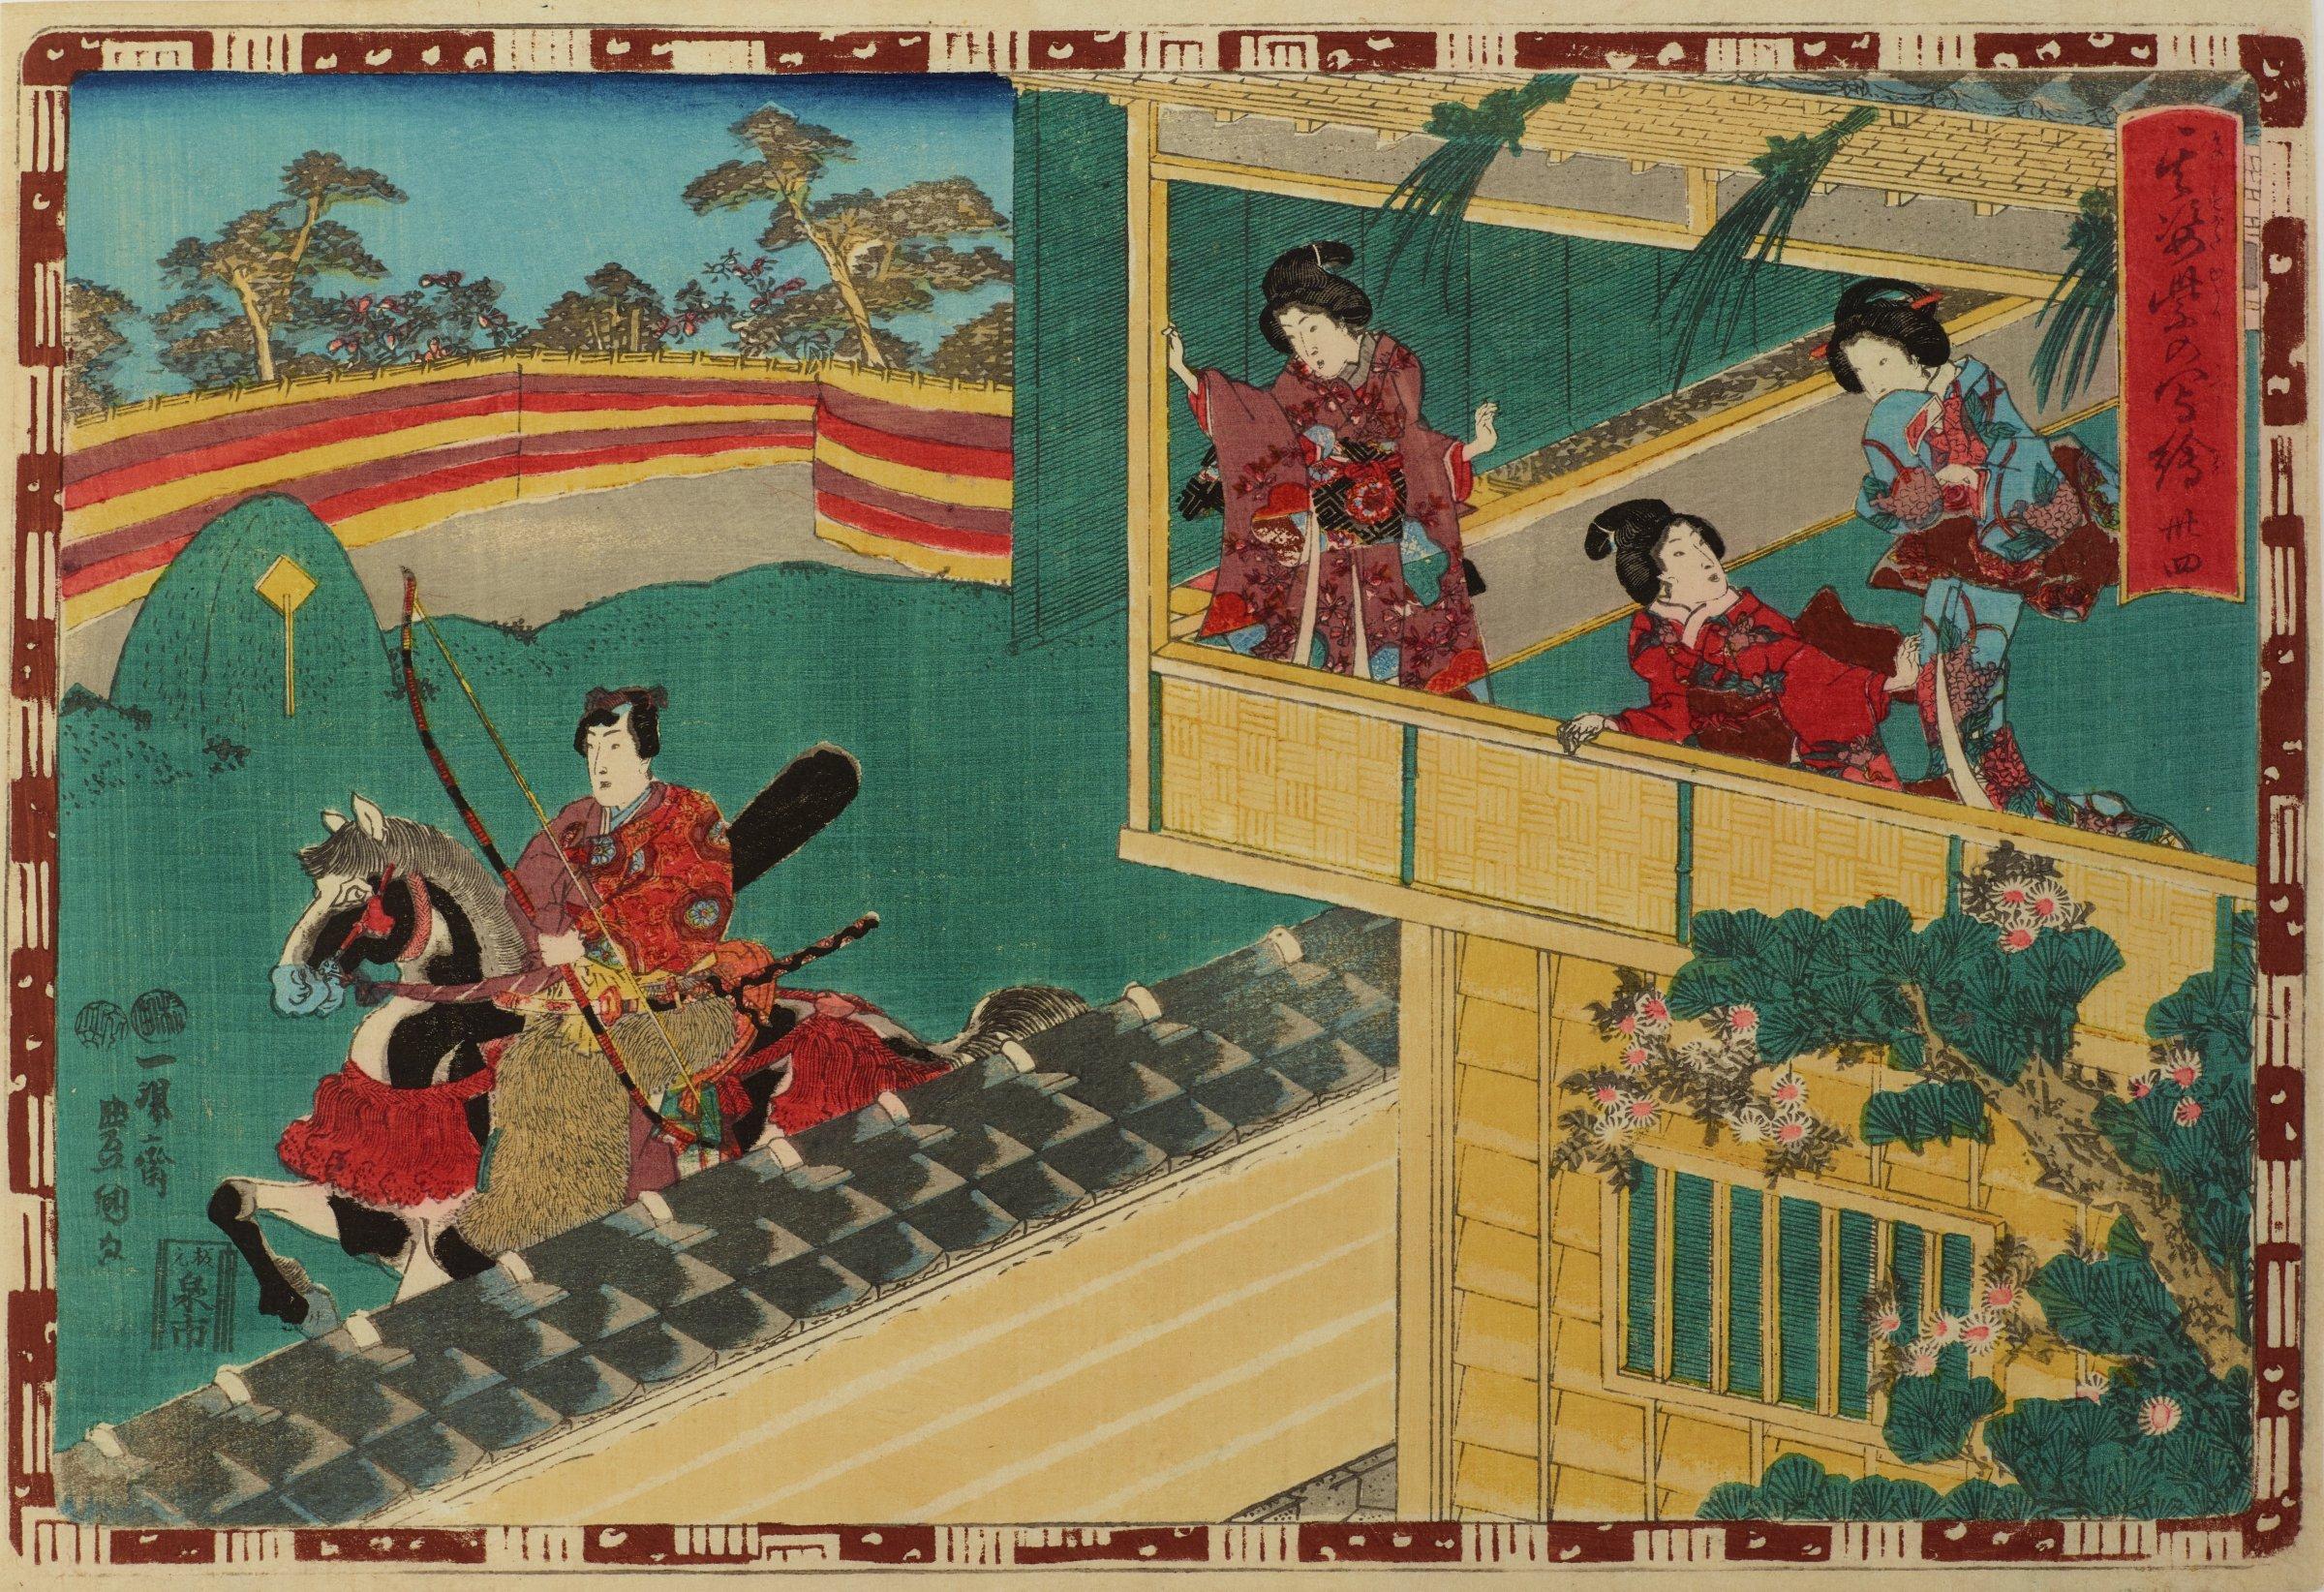 Genji Appearances in Illustration, no. 34, Utagawa Kunisada, ink and color on paper